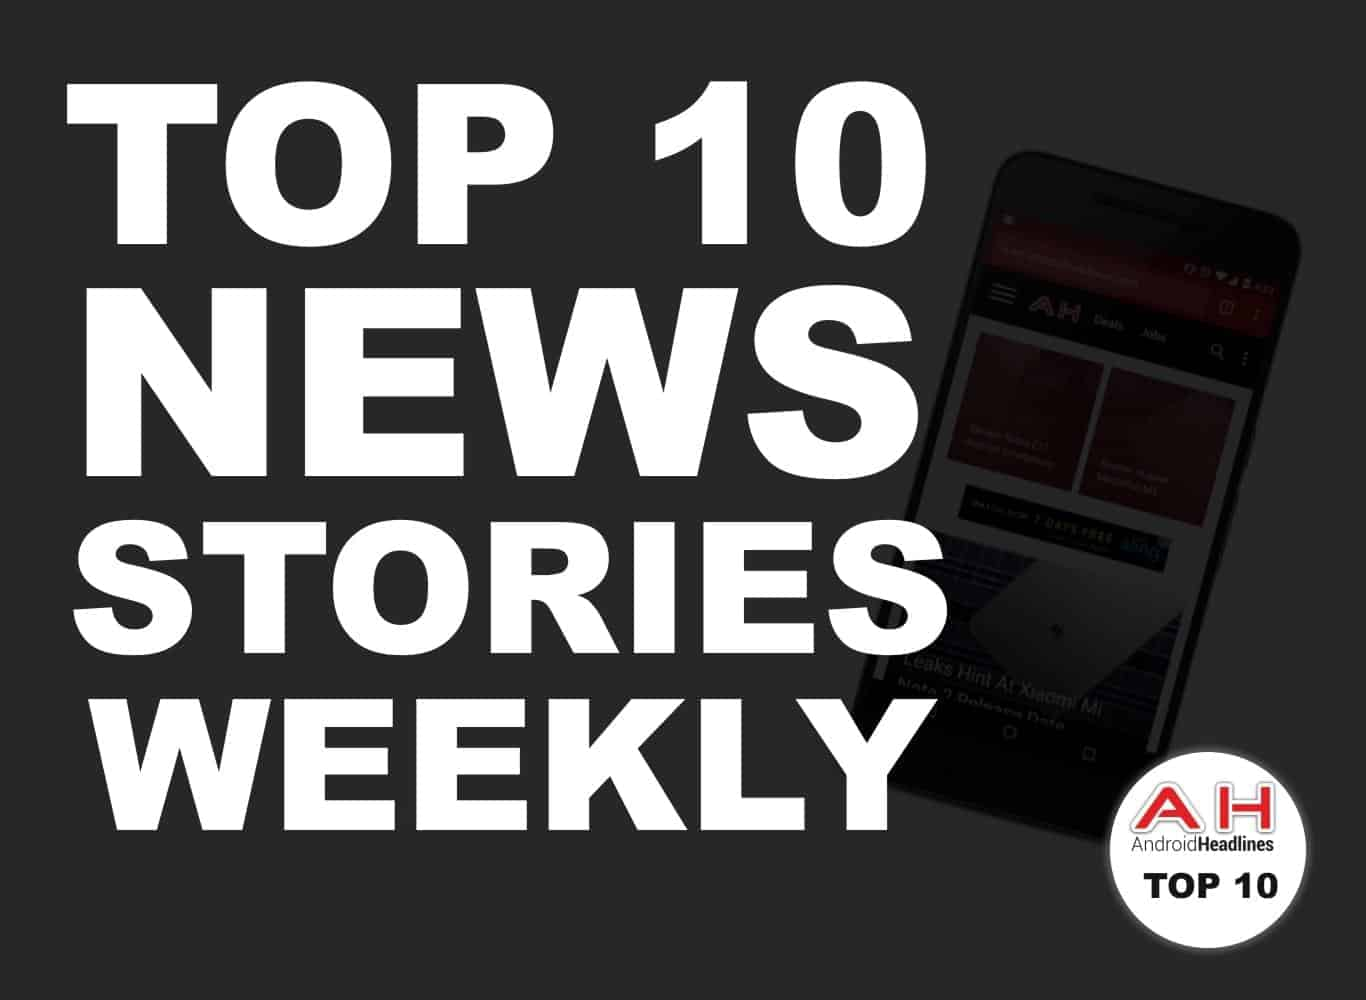 New News Stories